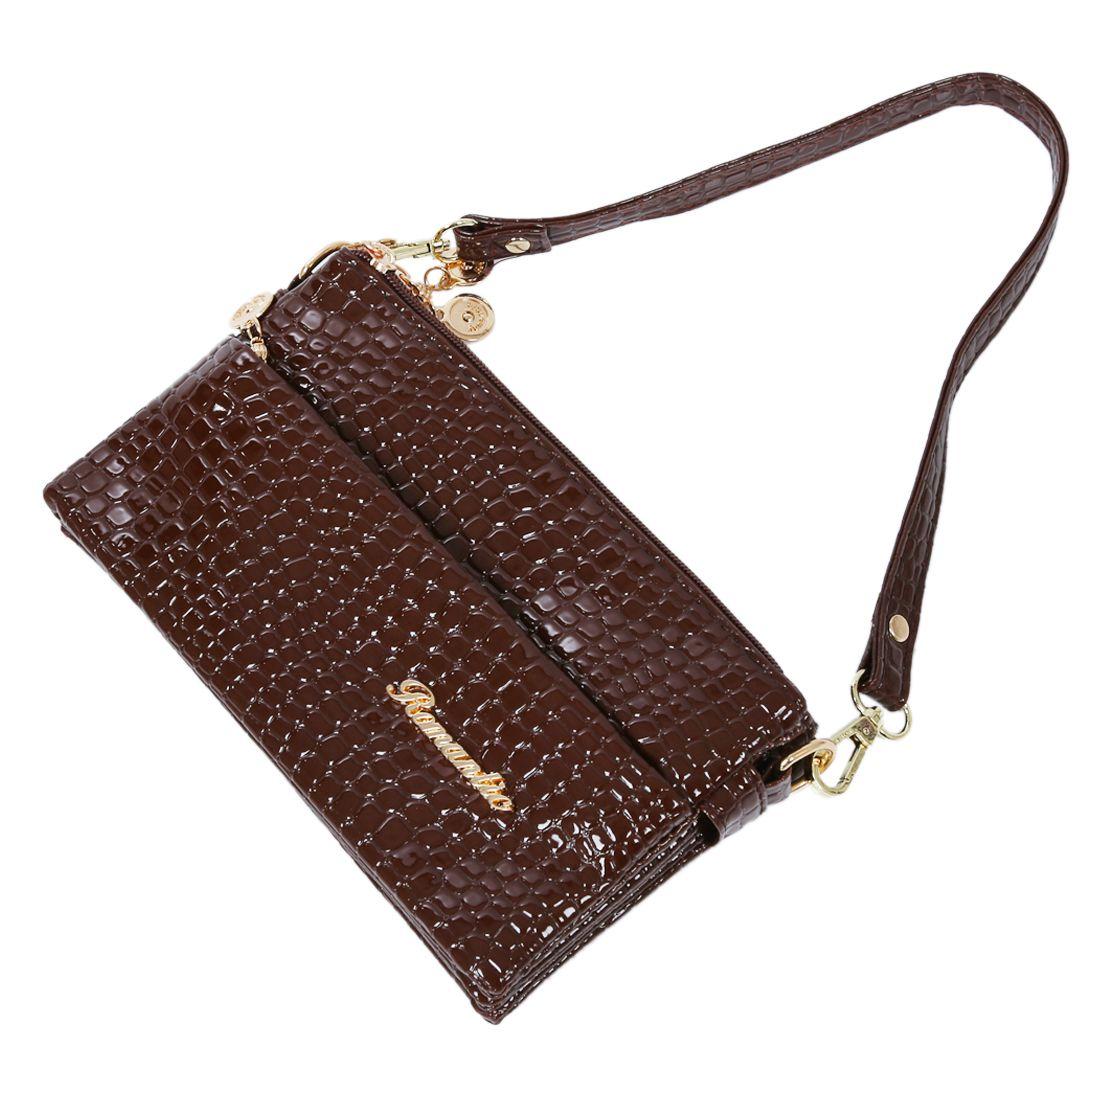 bolsos VSEN de hombro para mujer de de patrón bolso mano pequeño dPHPv